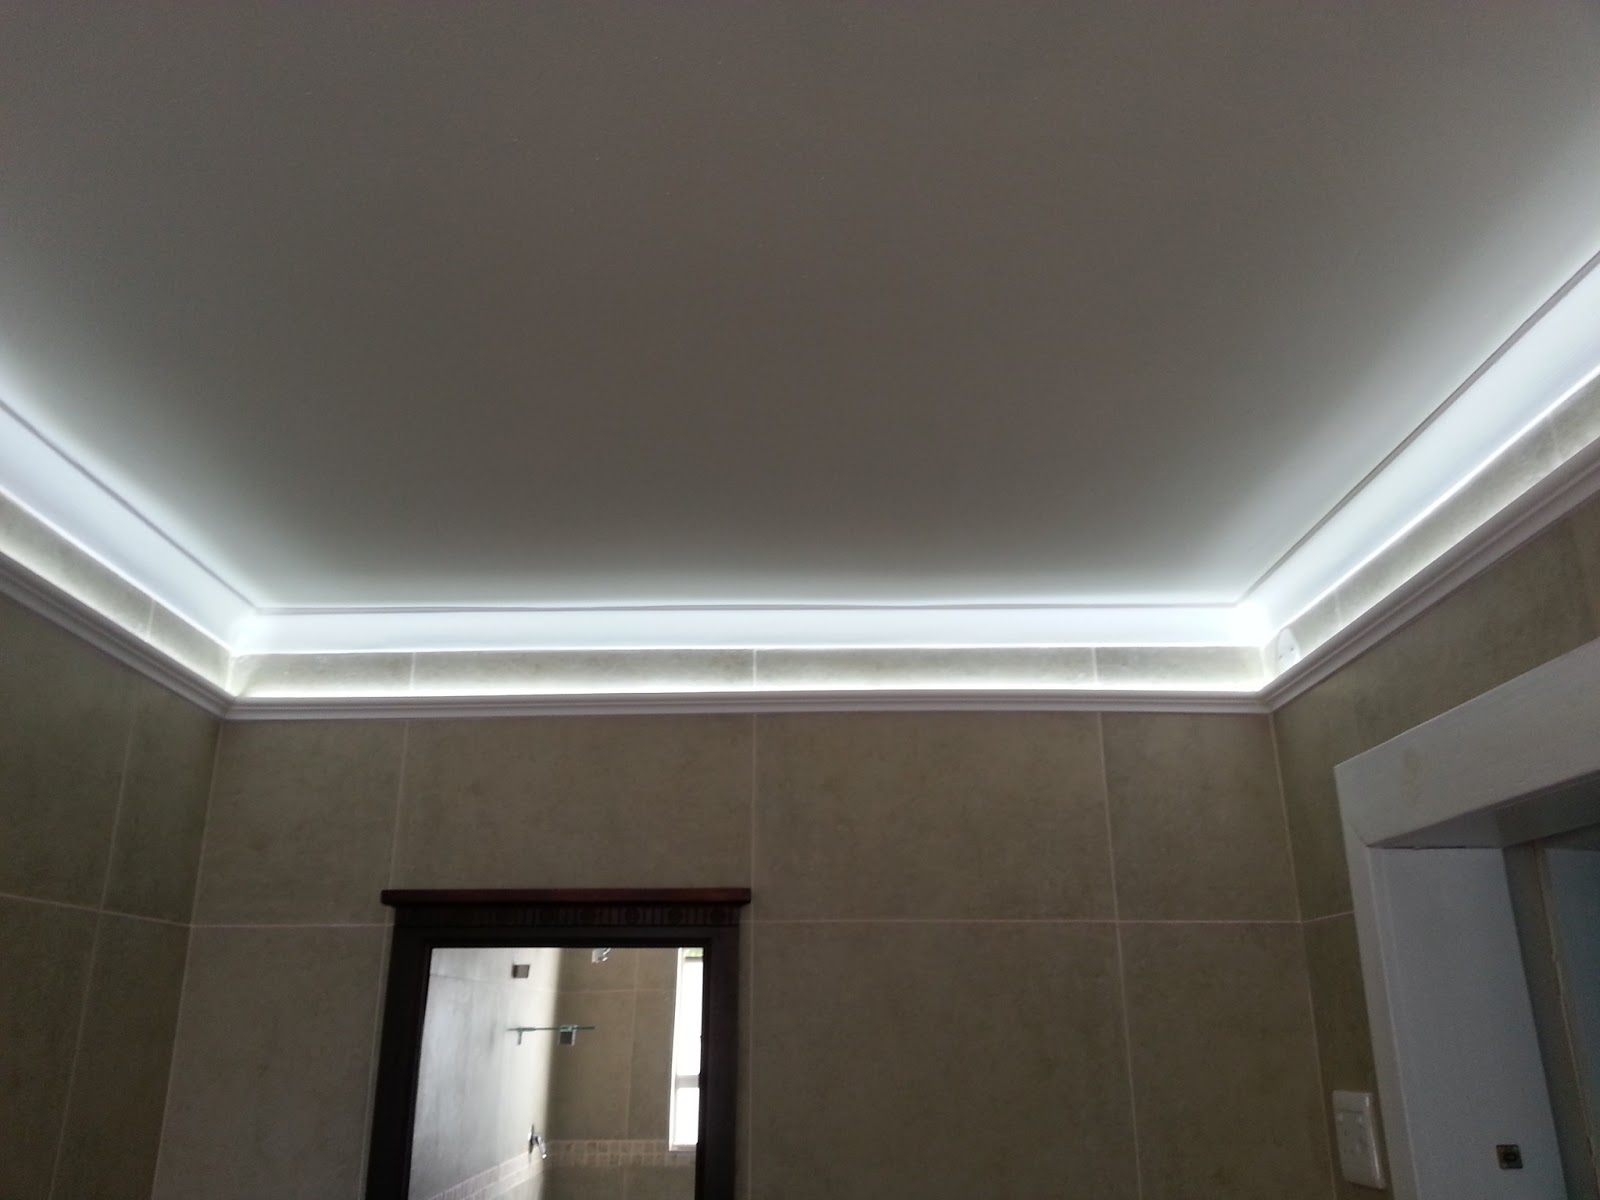 Bathroom Lighting Led Strips 60leds/m 5050 smd led strip light